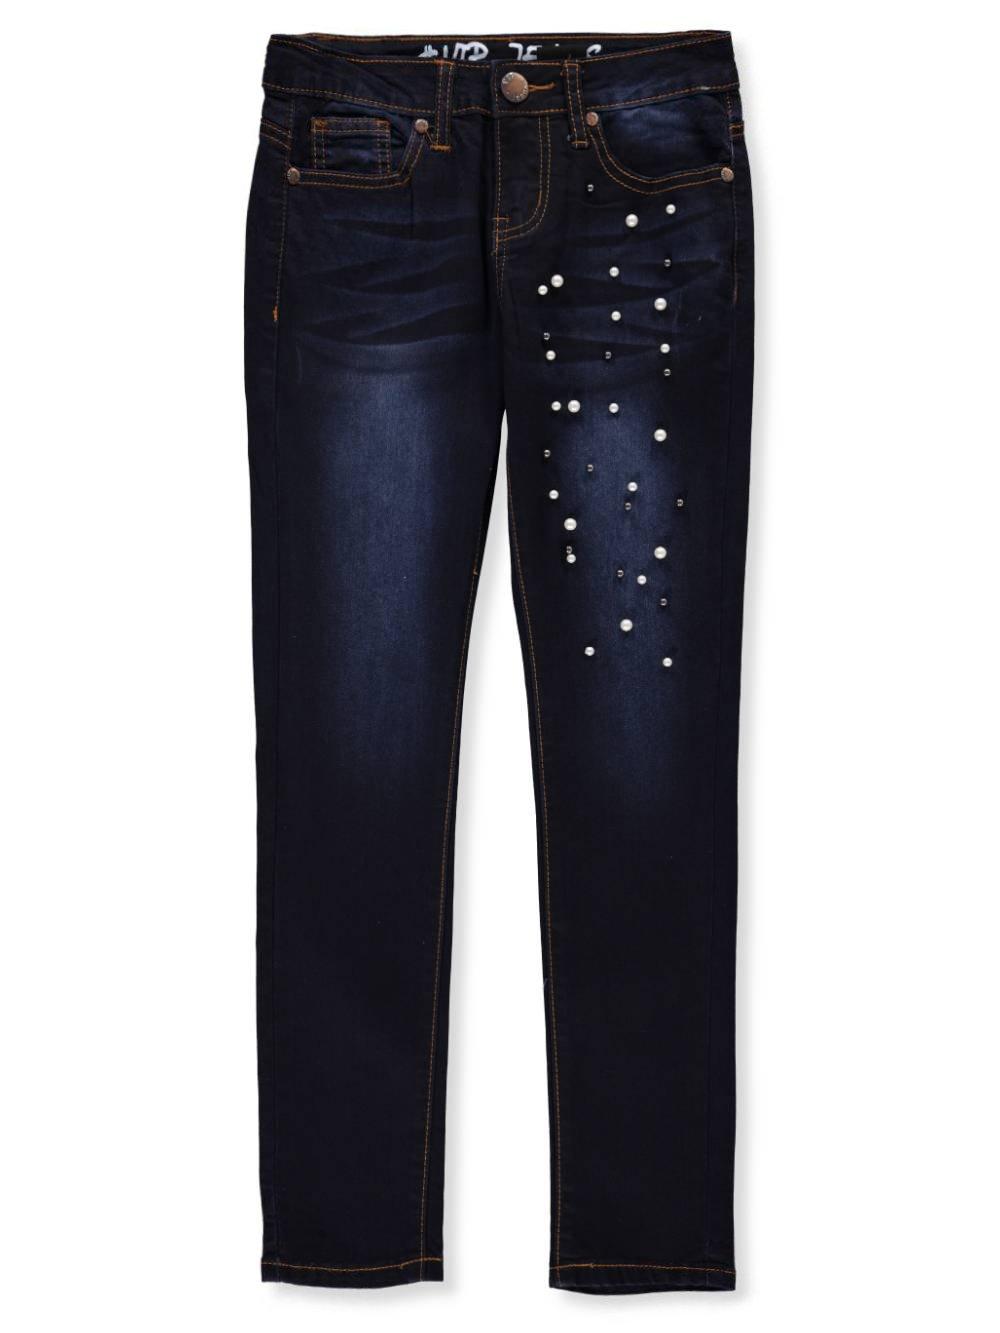 #VIP Jeans Girls' Jeans #VIP Jeans Girls' Jeans